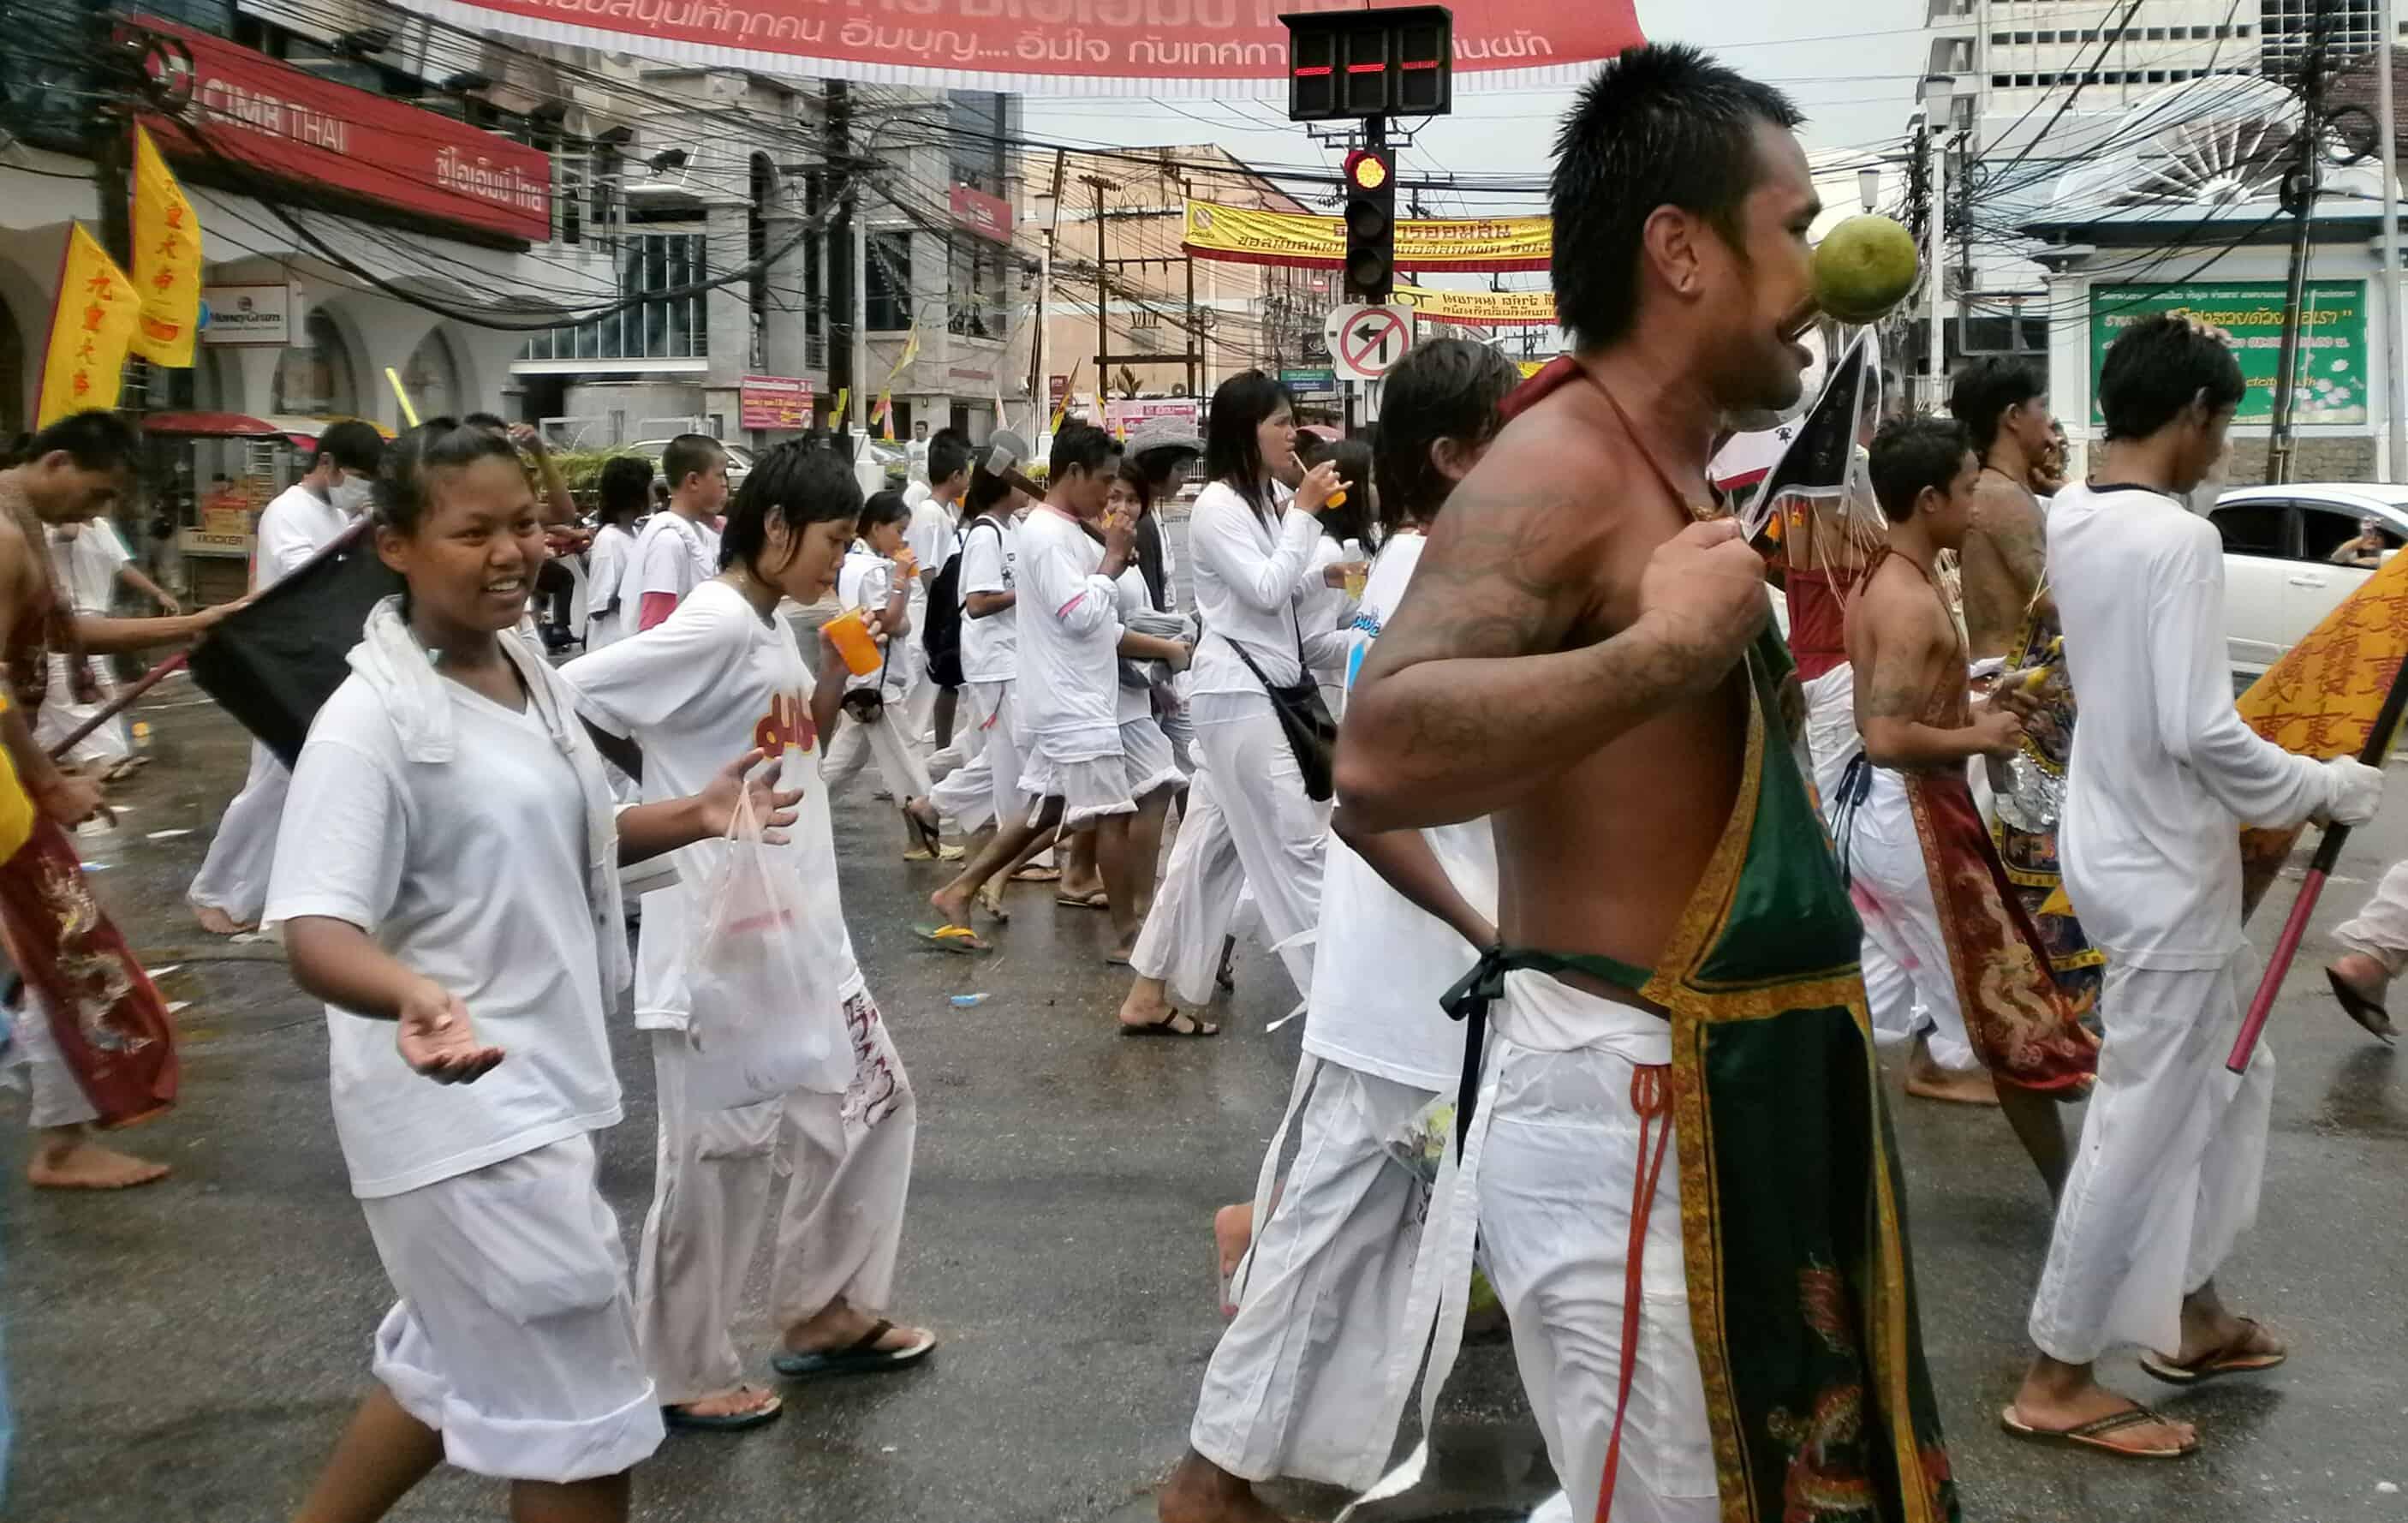 Tailandia Phuket Festival vegetariano - Festival vegetariano de Phuket: todo lo que tienes que saber